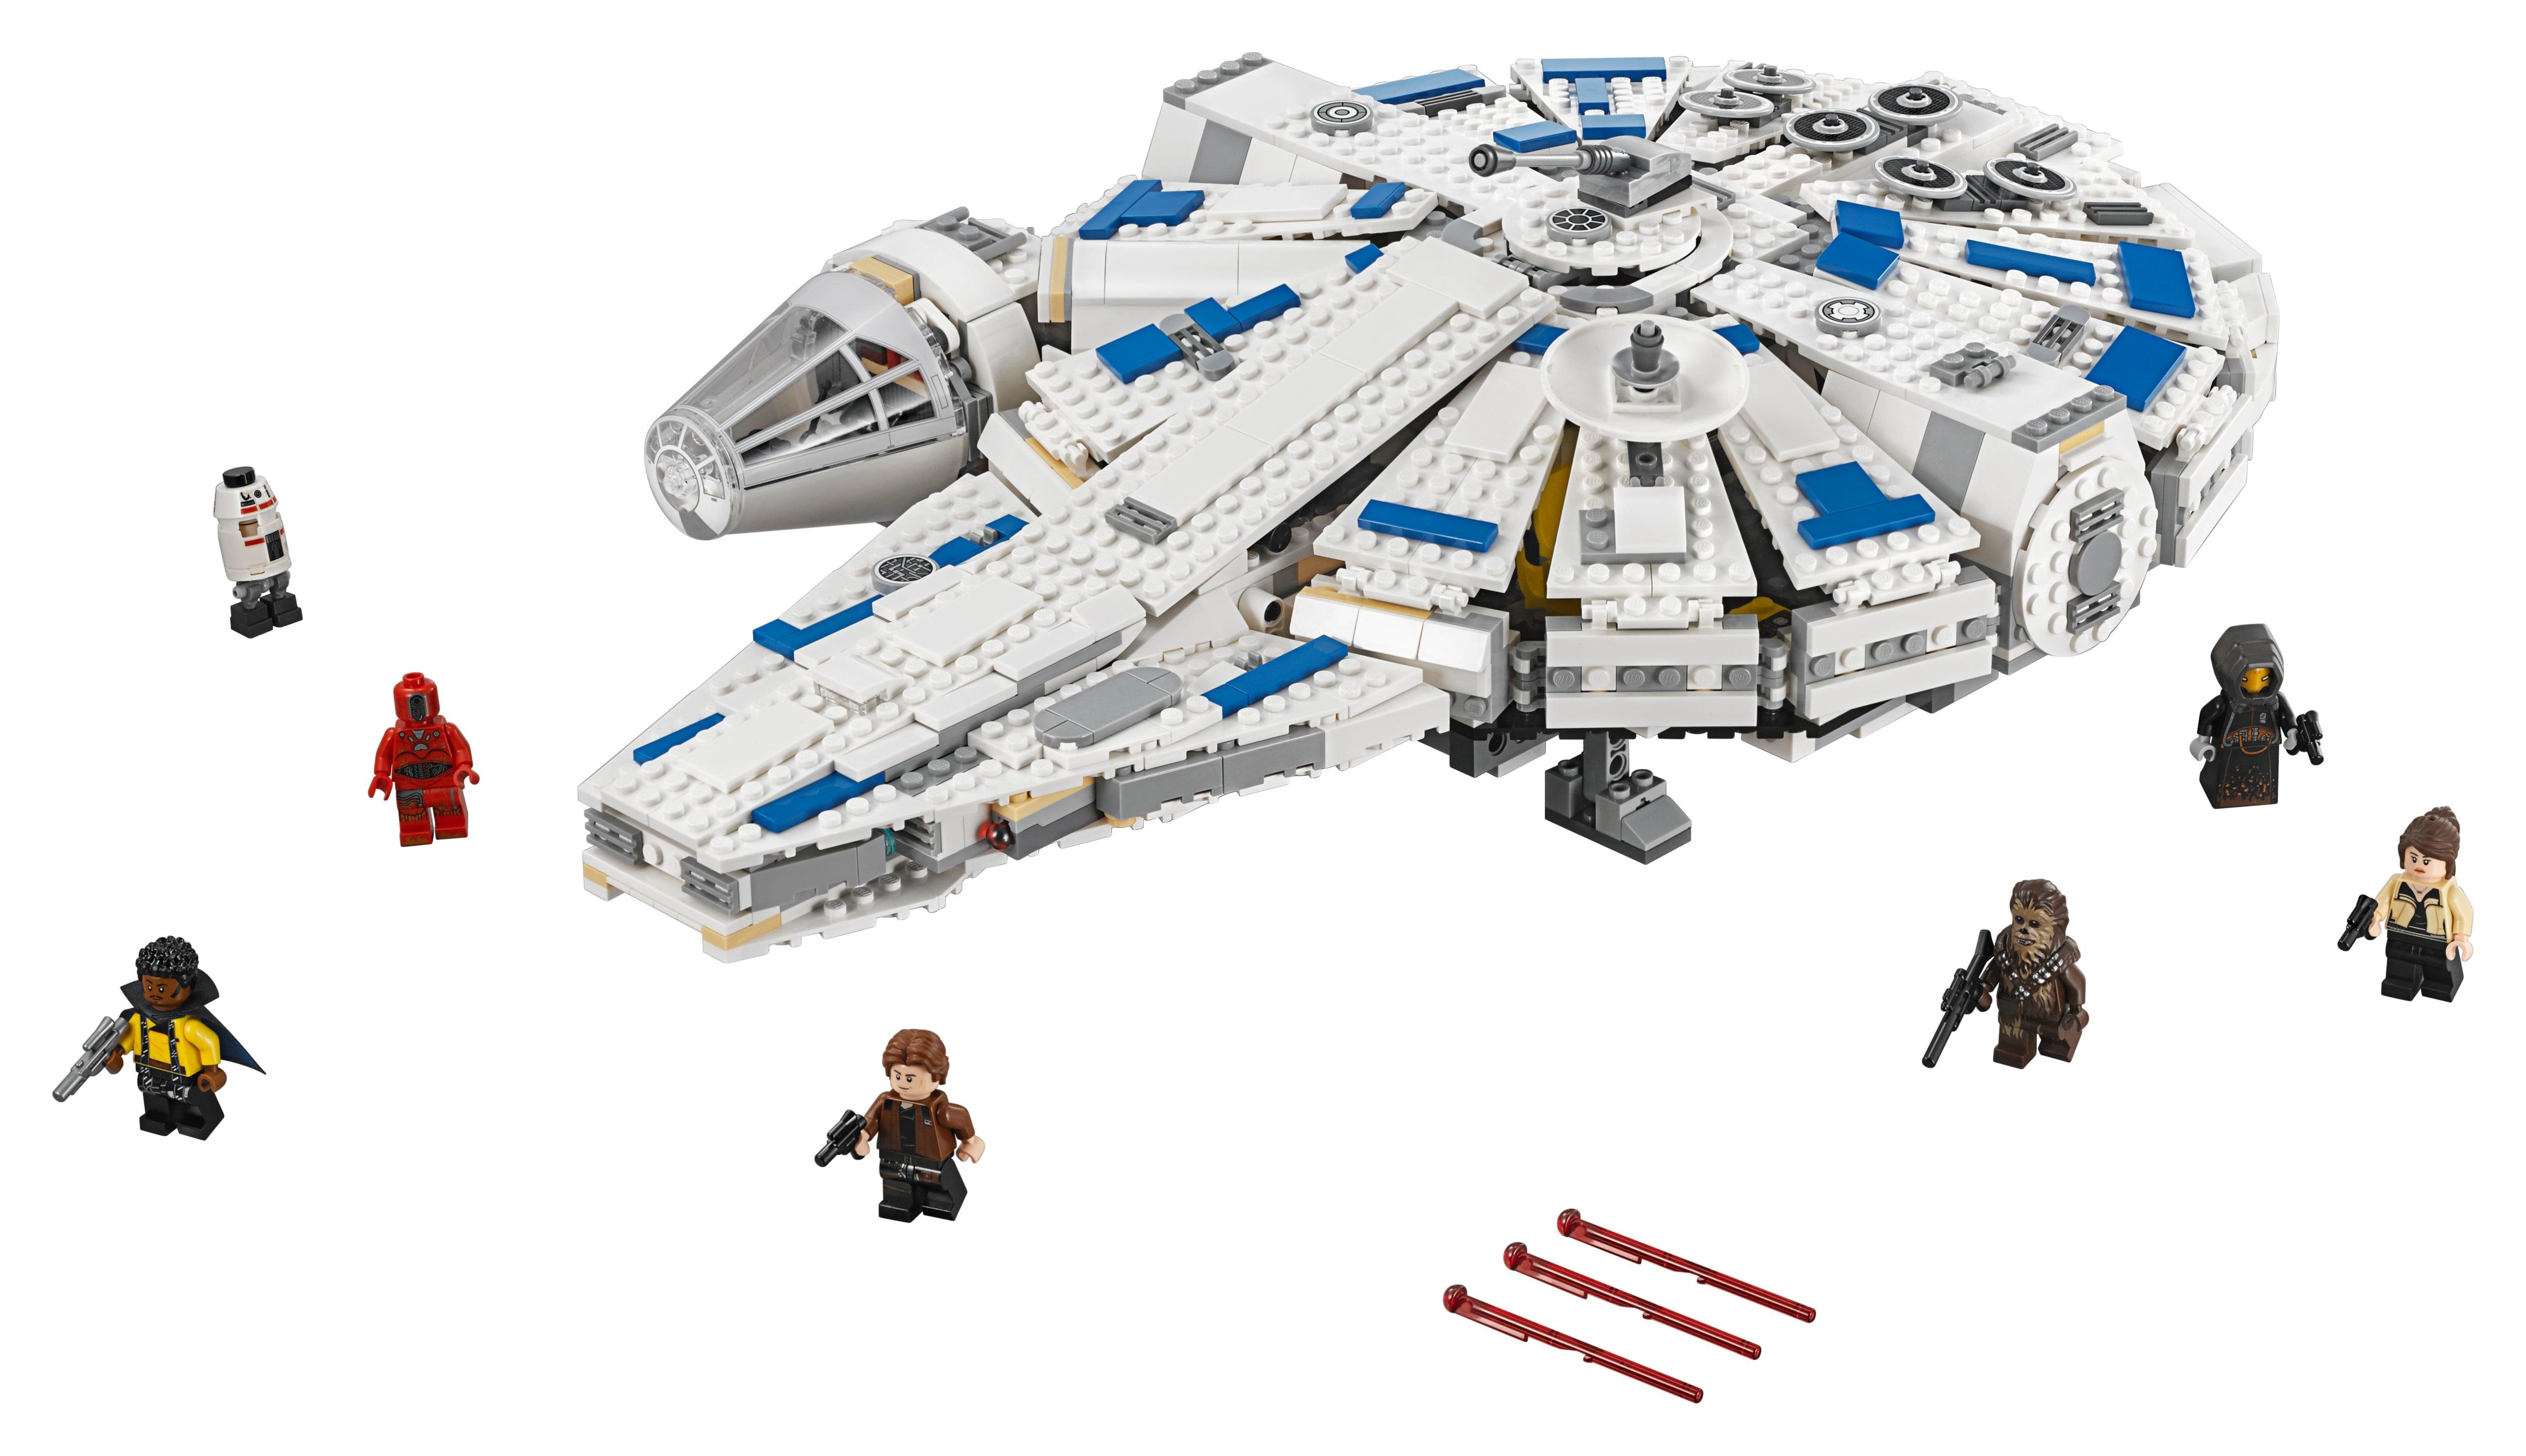 LEGO Building Toys LEGO Instruction Manuals INSTRUCTIONS MANUAL ...